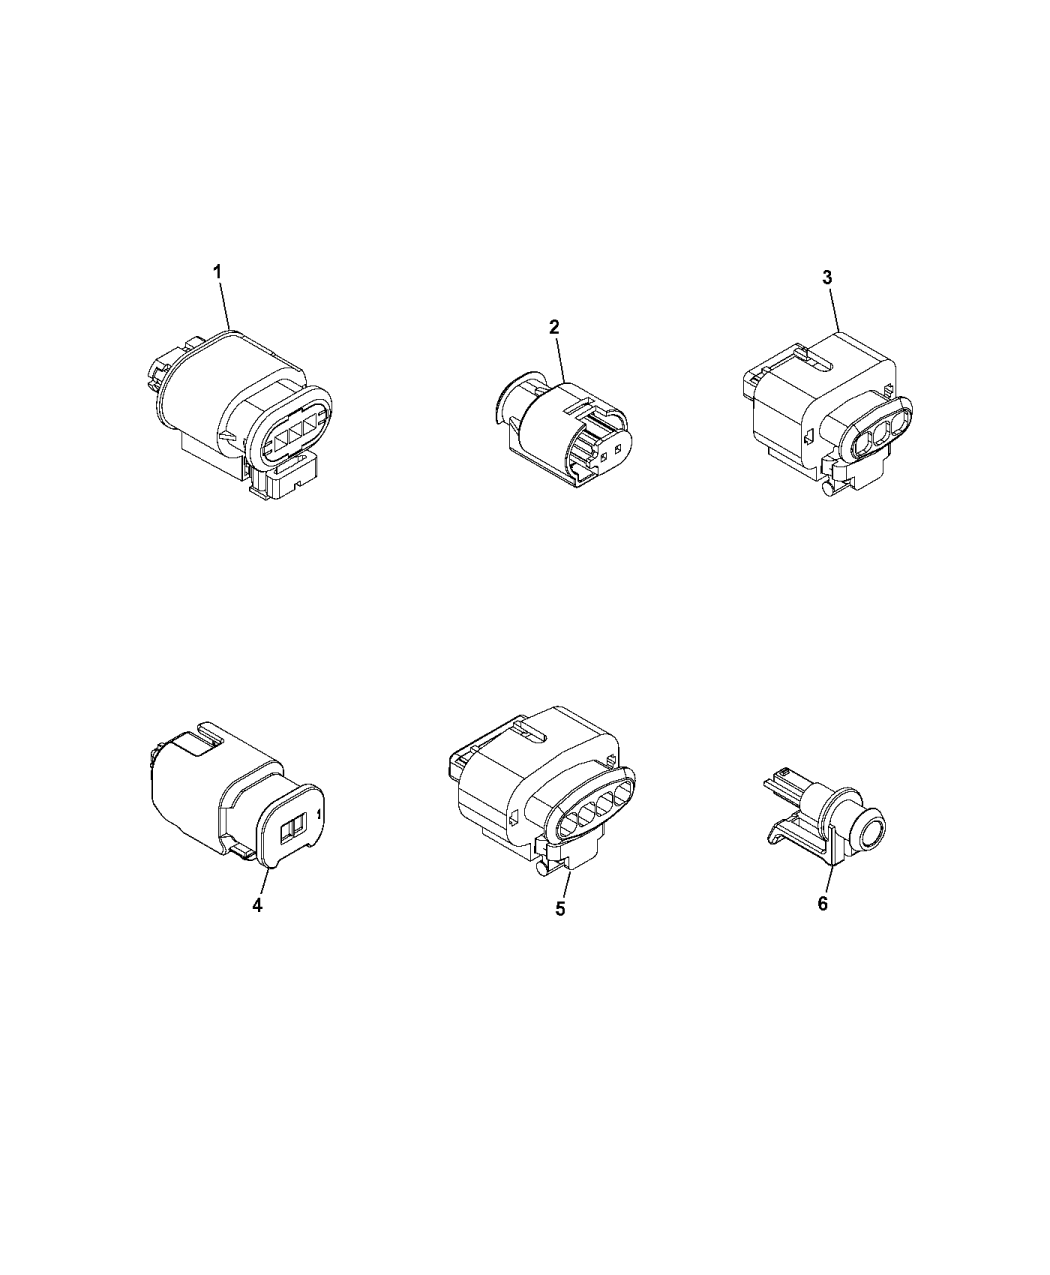 2015 Jeep Renegade Wiring Repair Connectors - Thumbnail 1